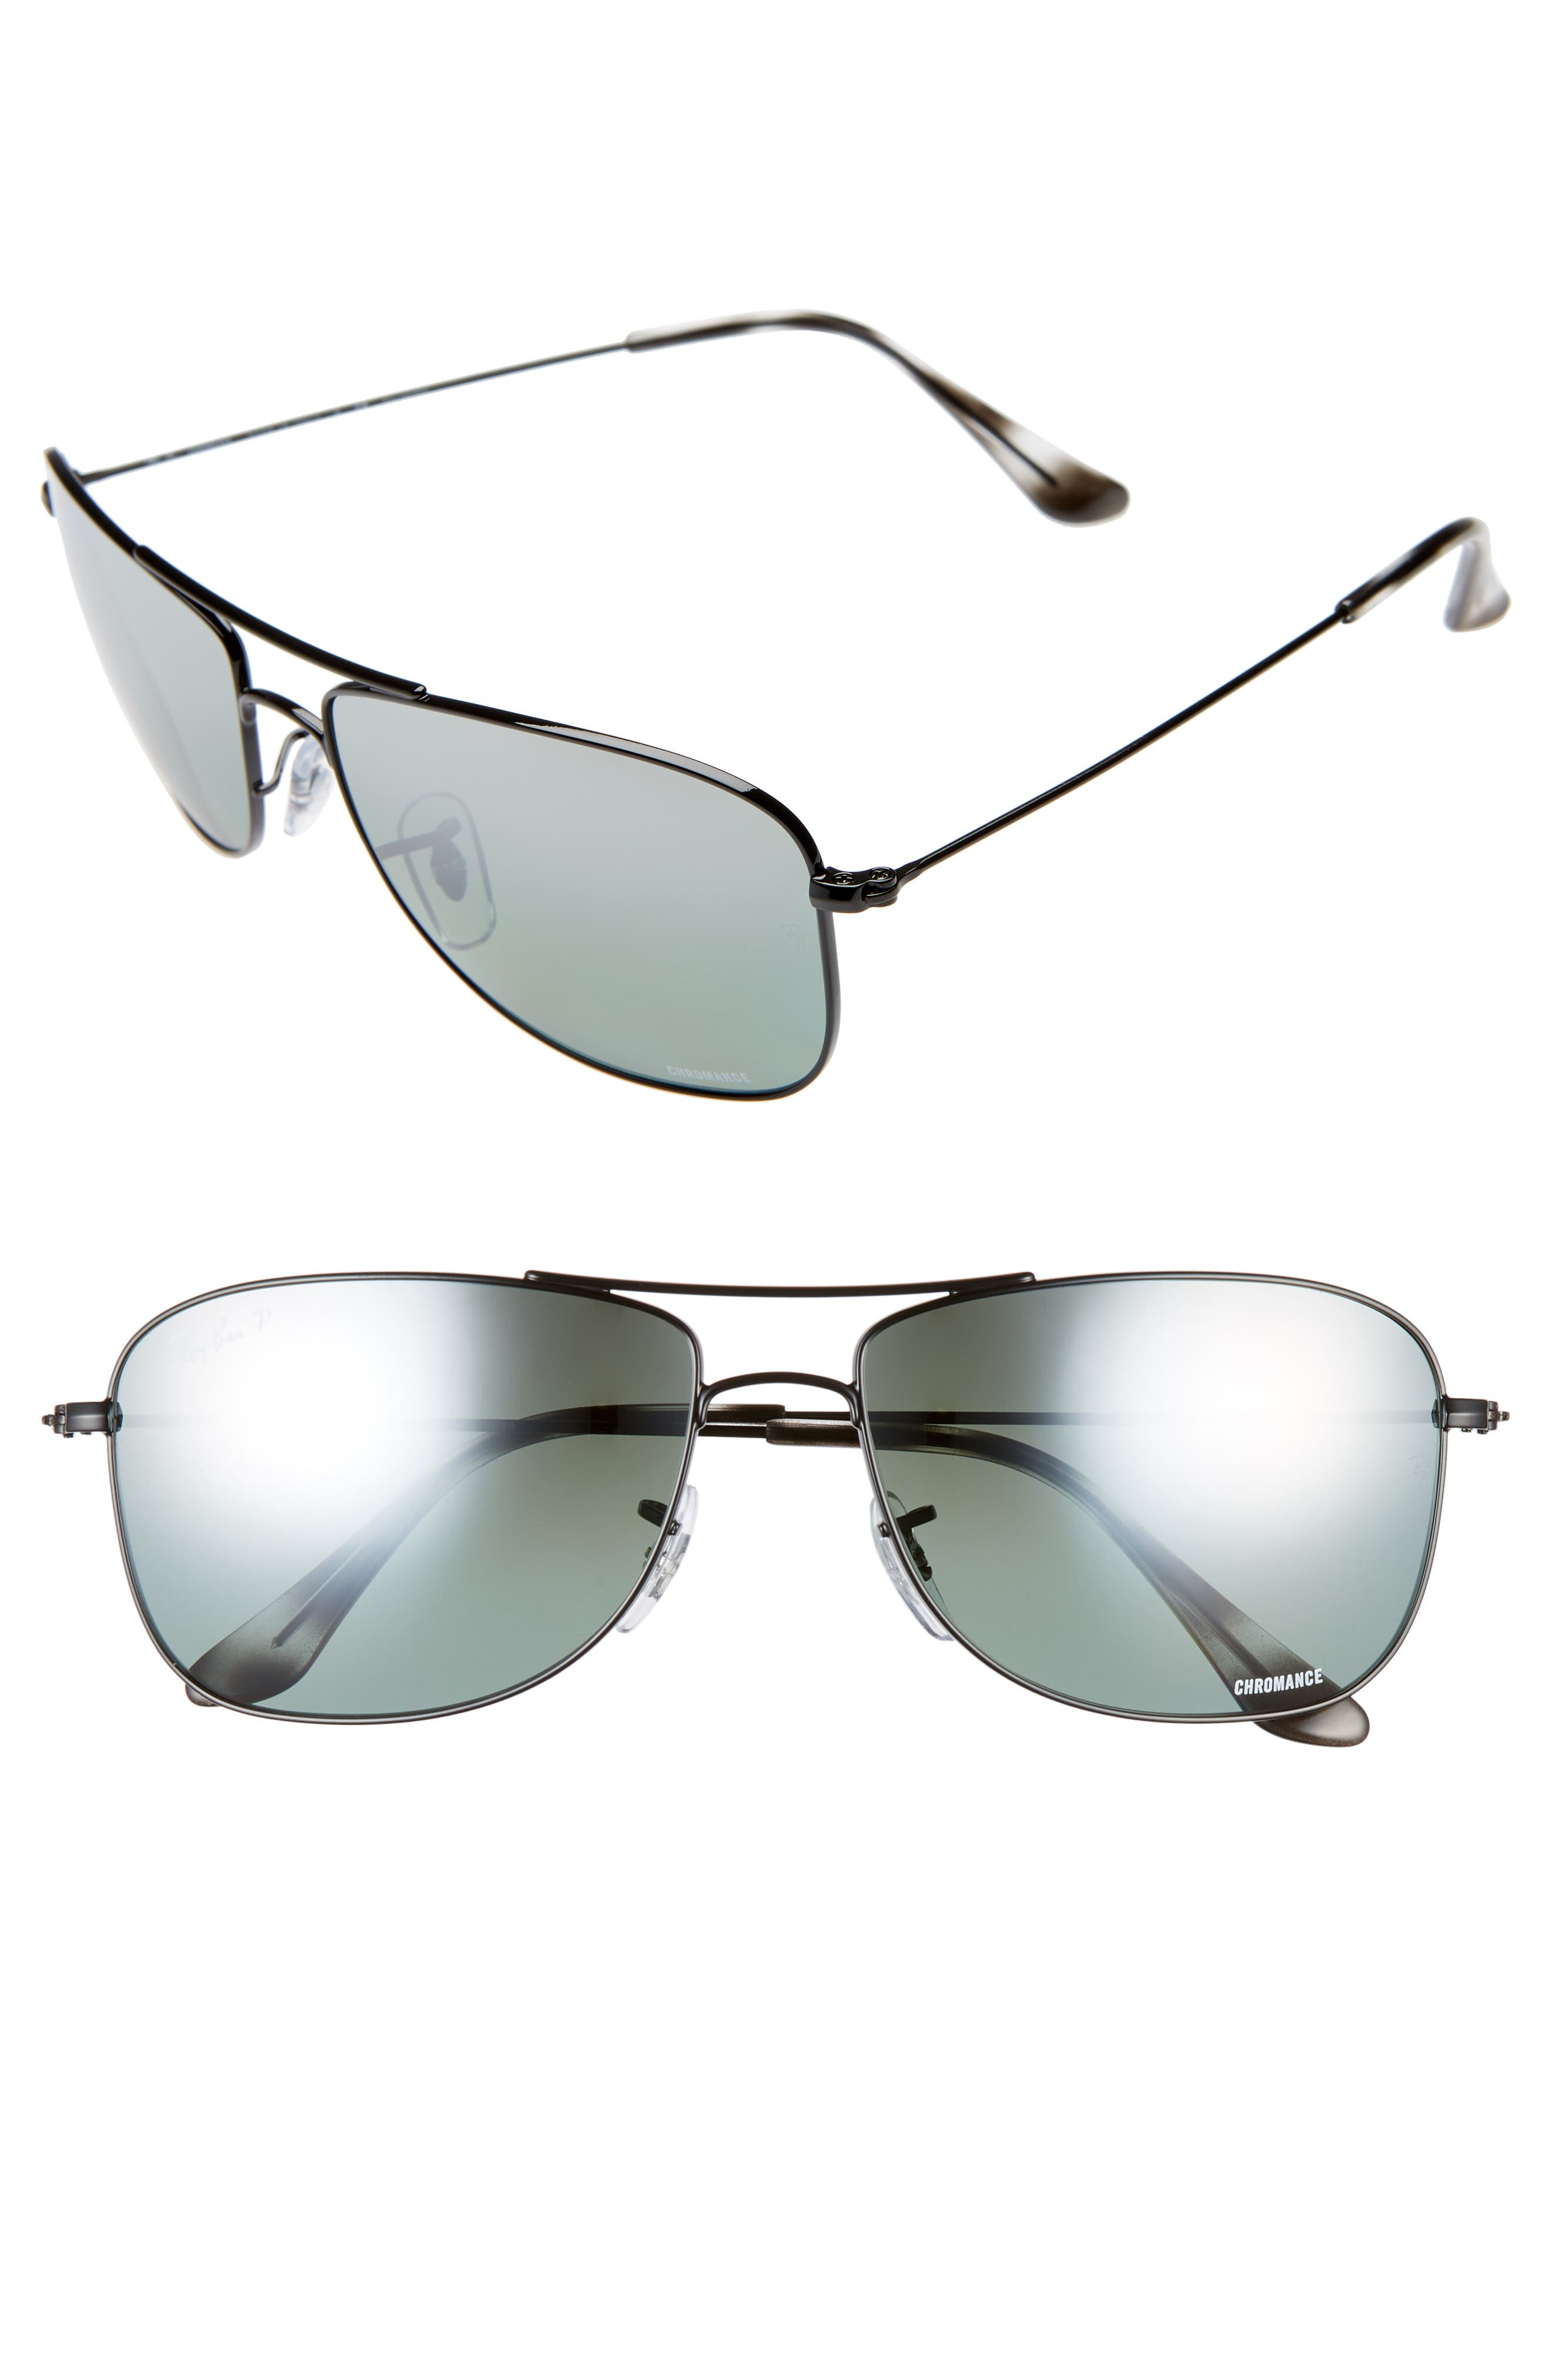 bf2f2ea1204c Ray-Ban Tech 5m Polarized Sunglasses - Black Gradient Mirror